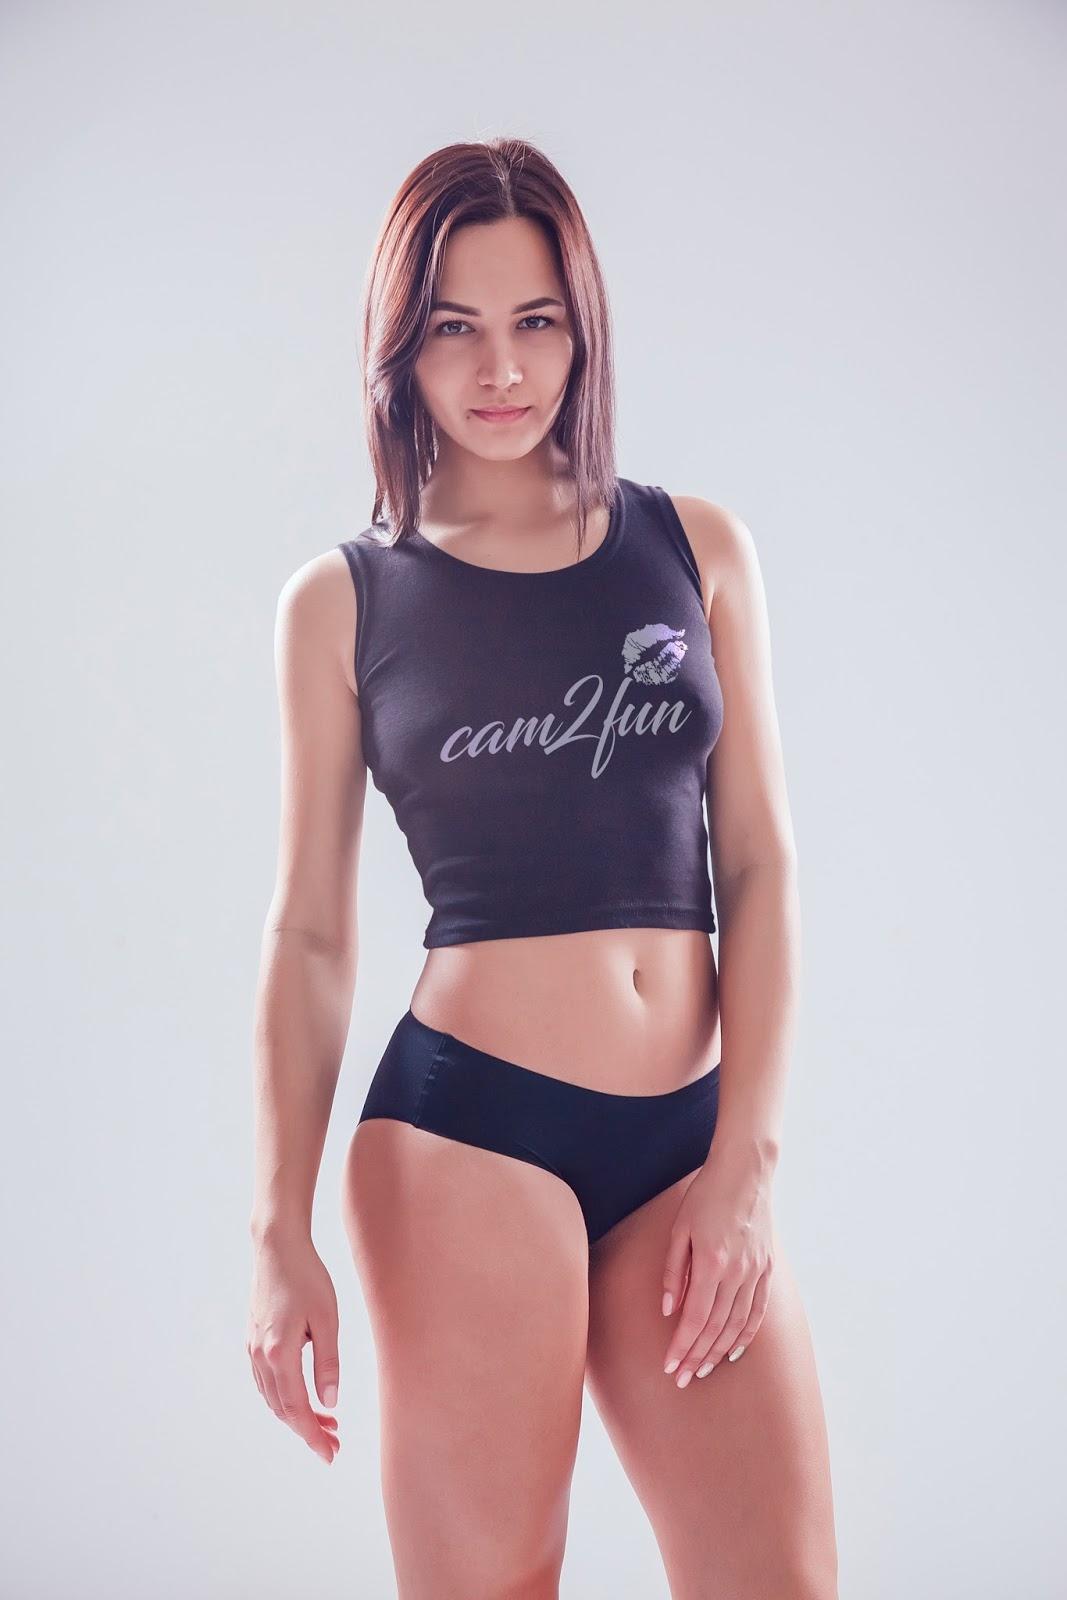 Pamela anderson fucking anal